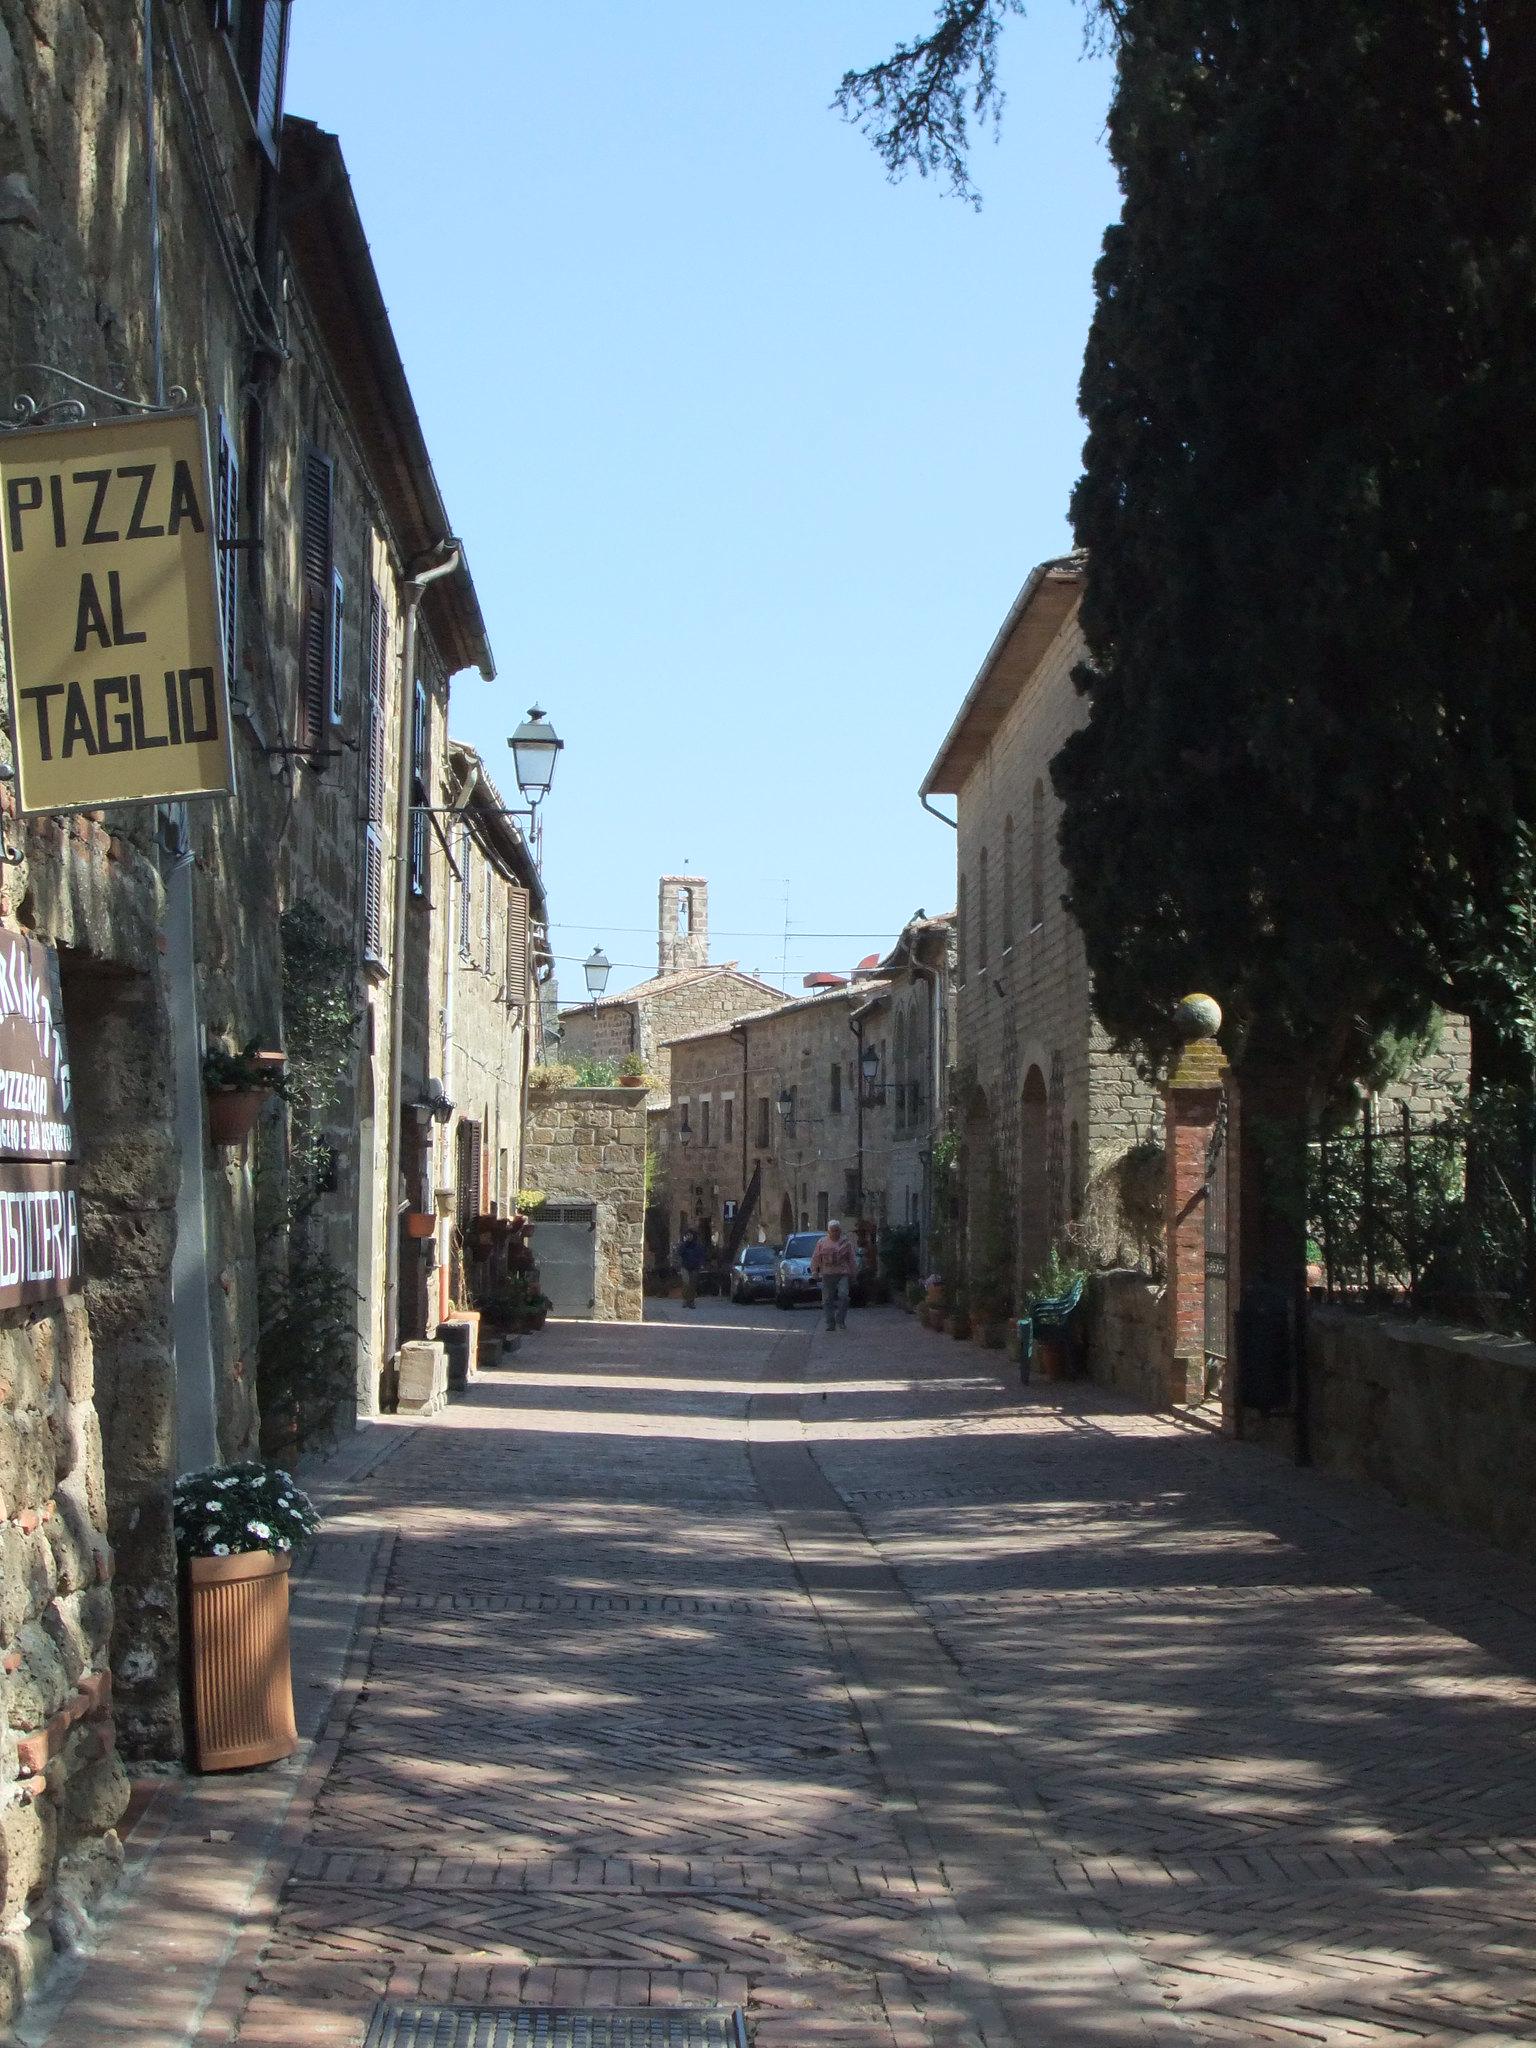 visiter la Toscane - Sorano